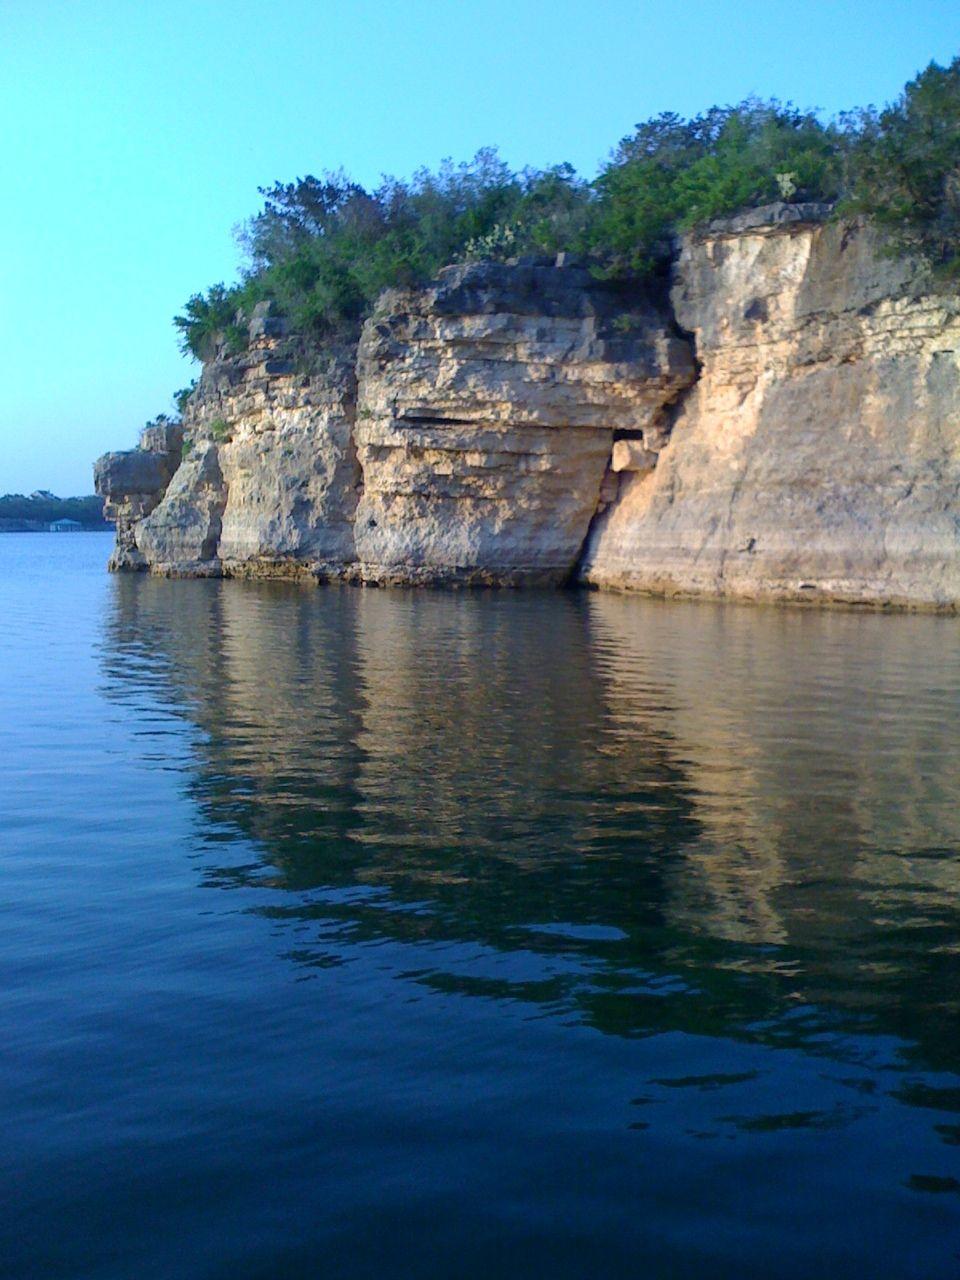 Lake travis texas pinterest for Fishing spots in austin tx